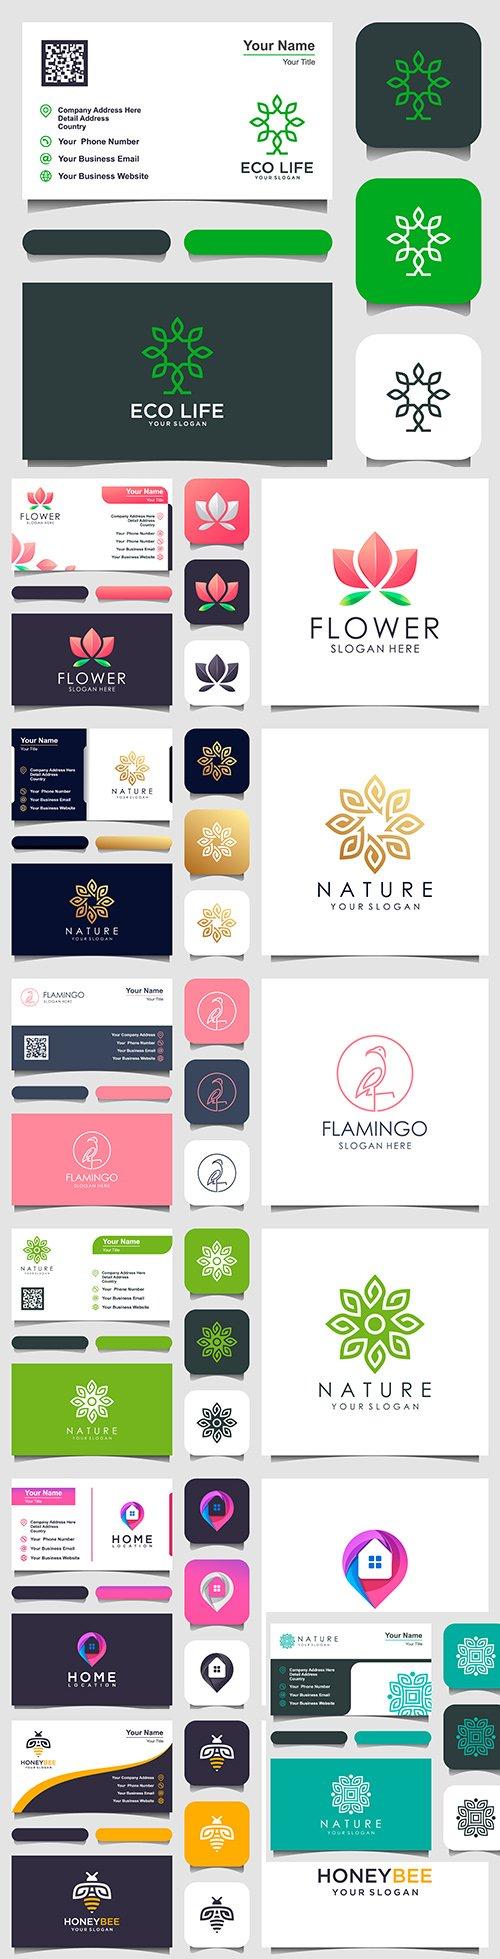 Logo design and business card minimalist elegant element 3